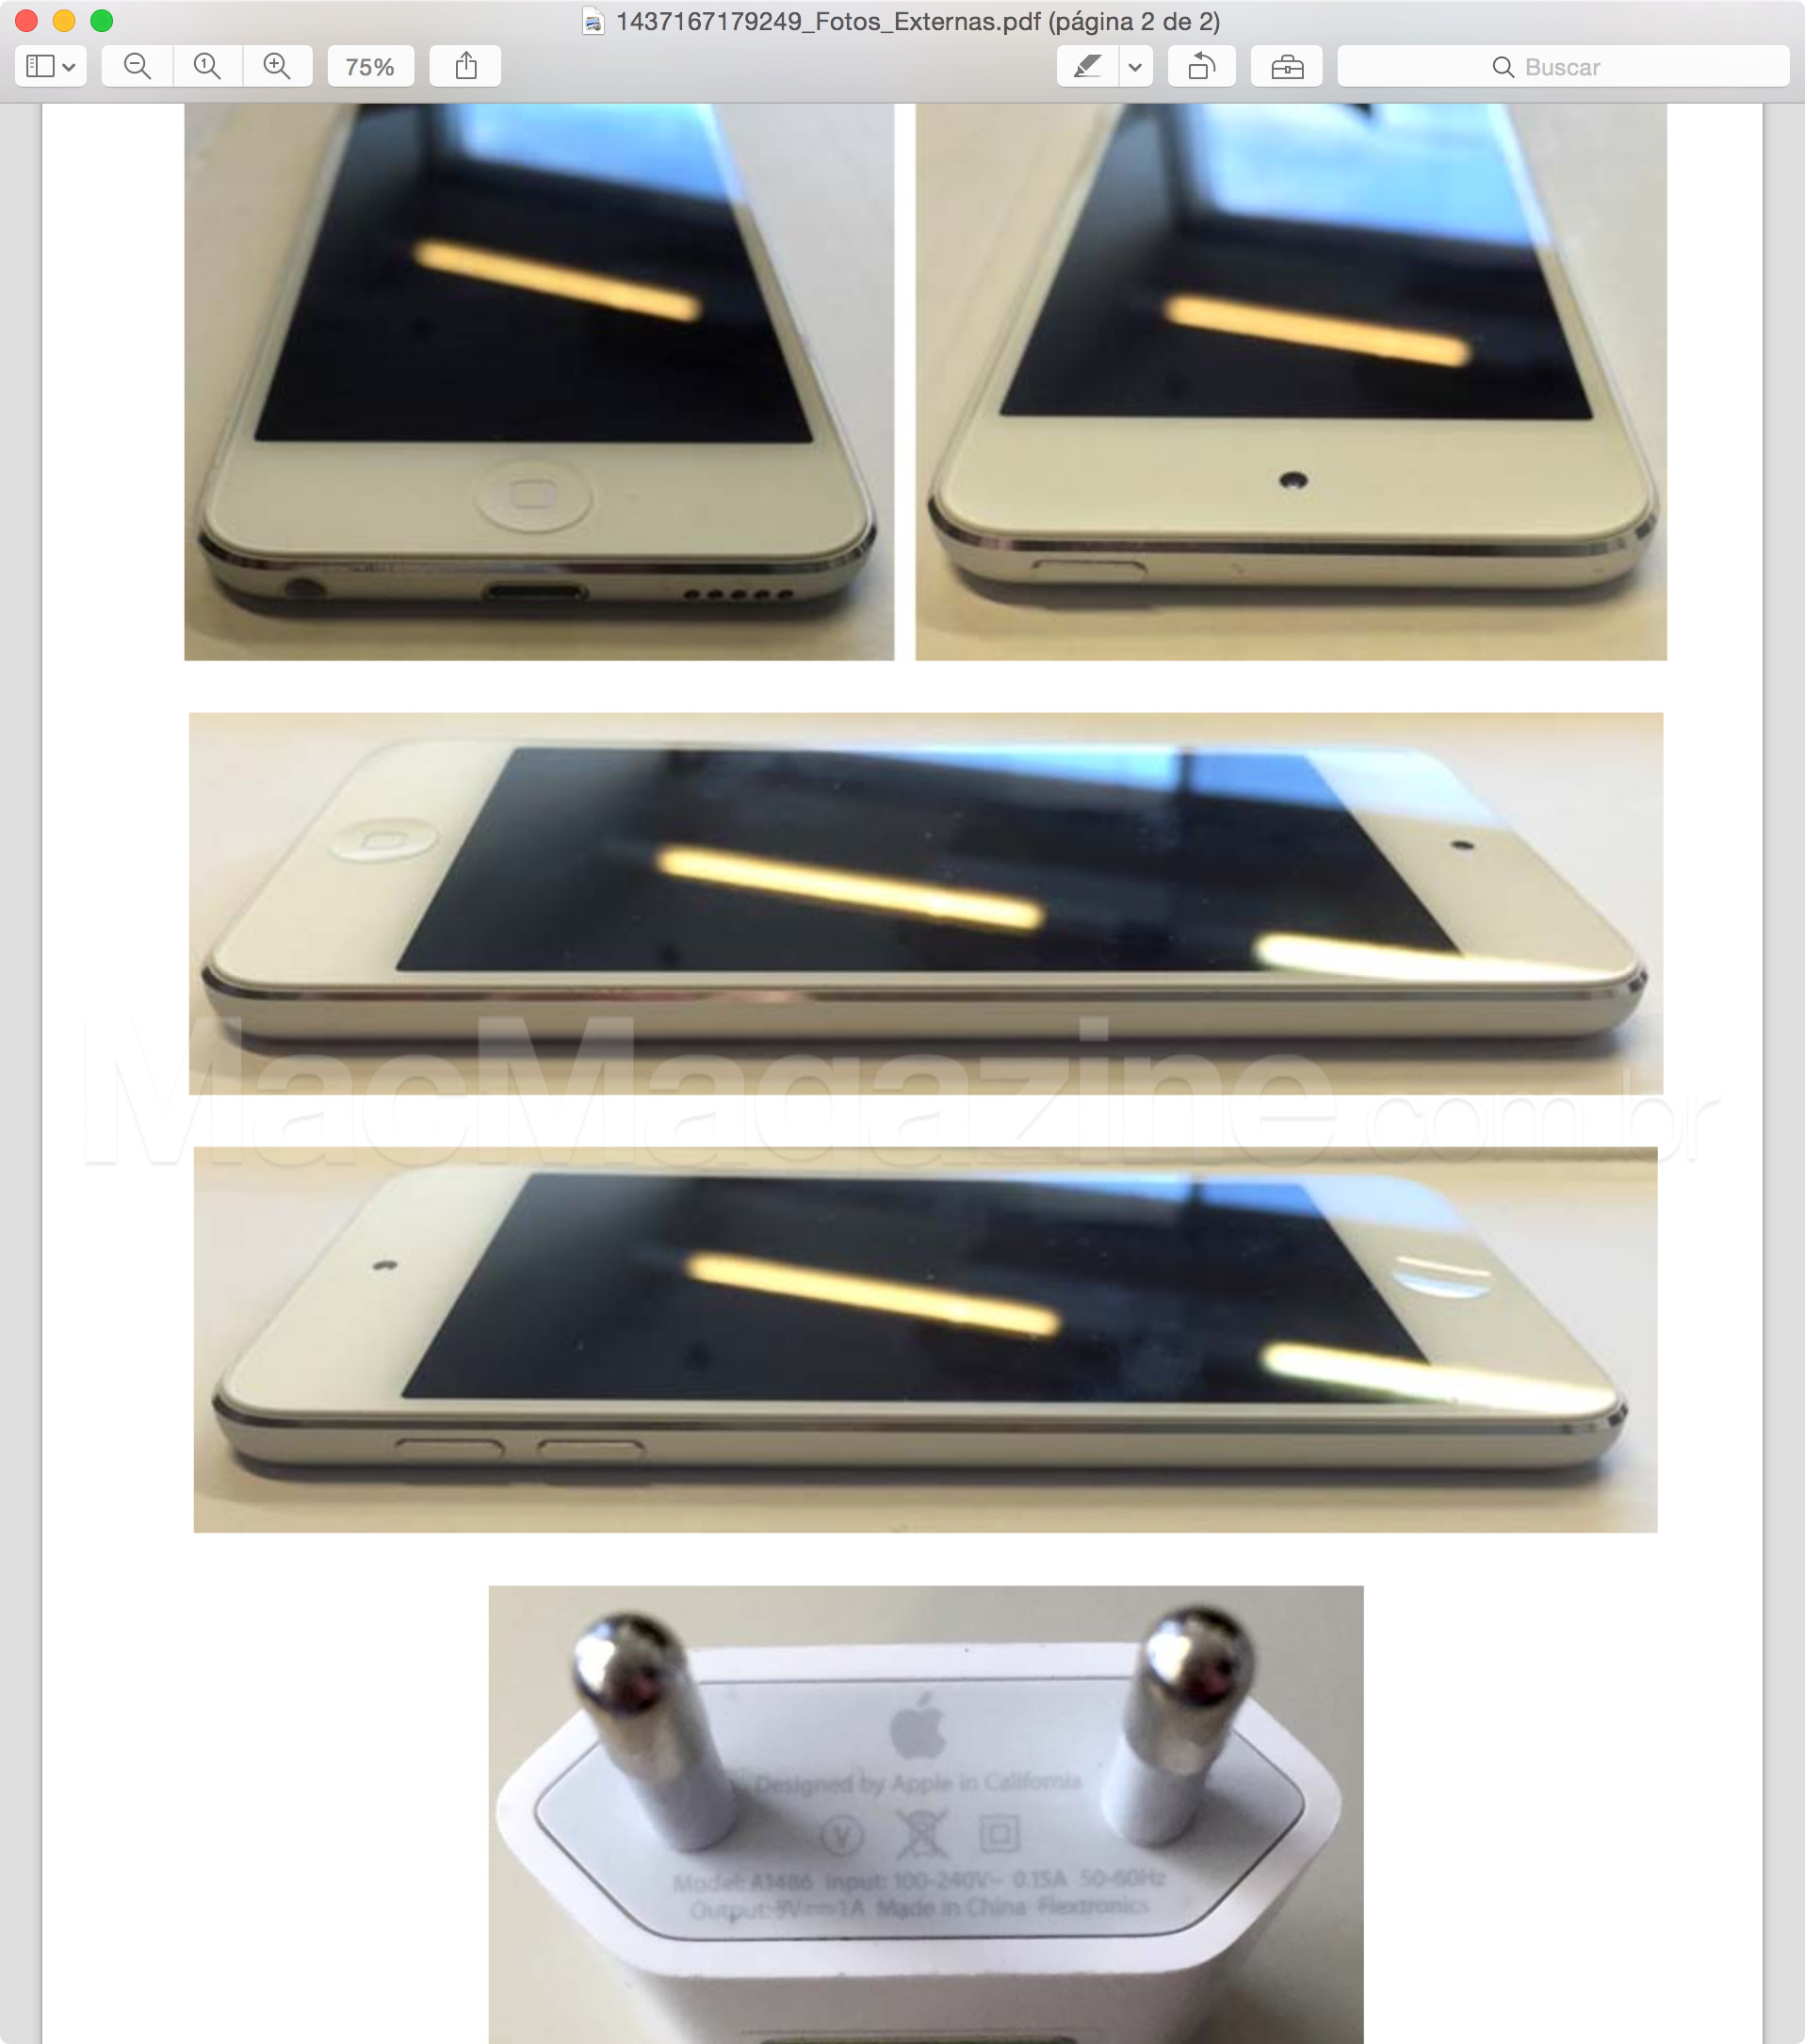 ANATEL homologa iPod touch